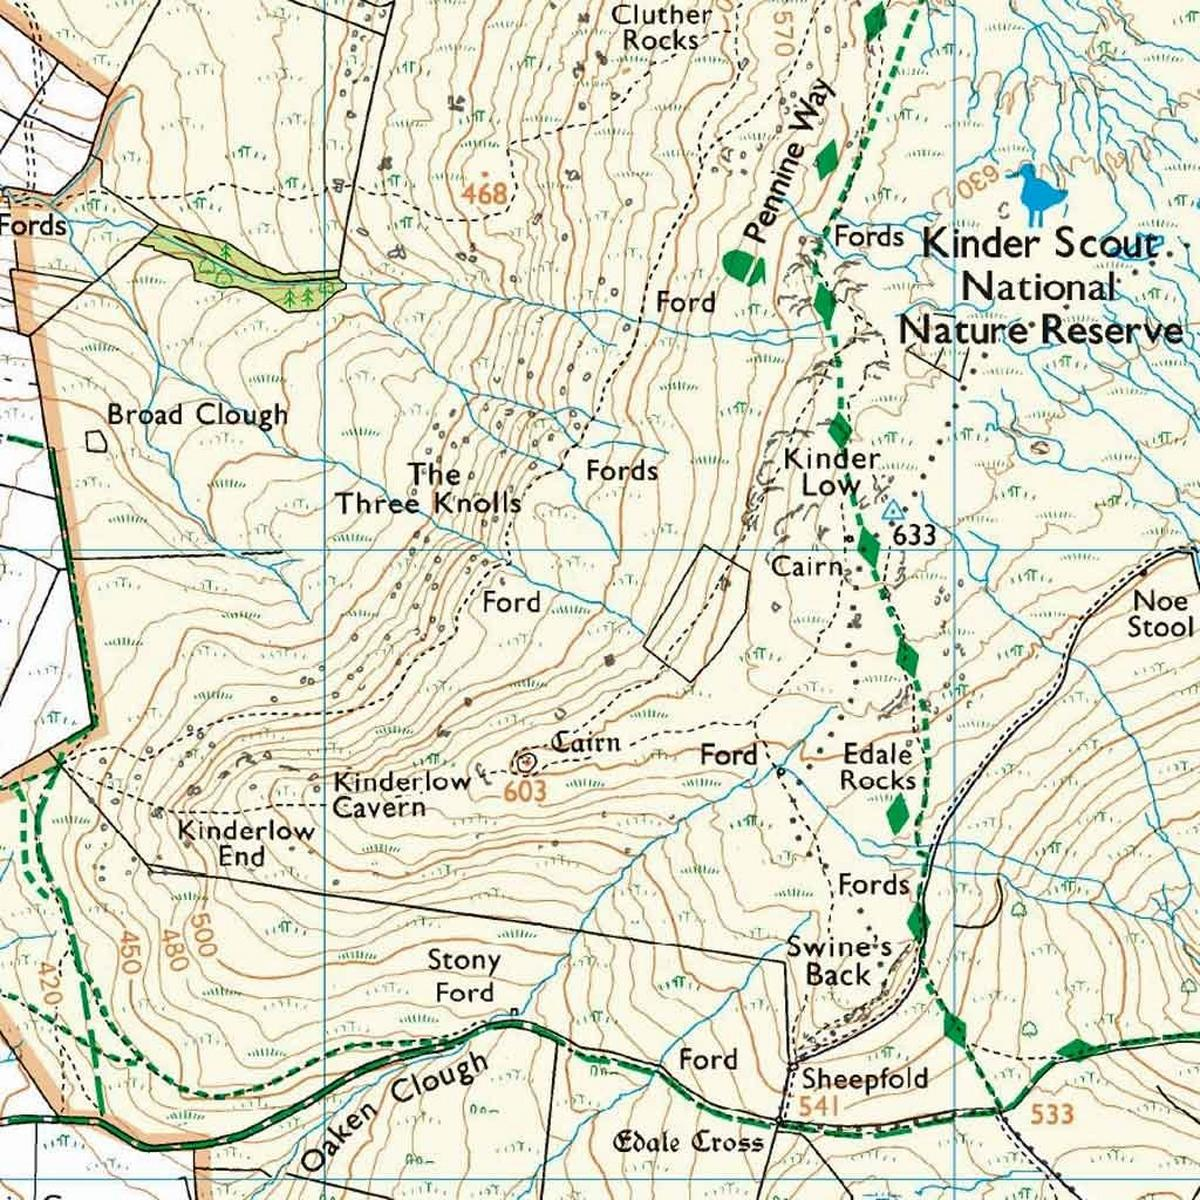 Ordnance Survey OS Explorer ACTIVE Map OL1 The Peak District - Dark Peak